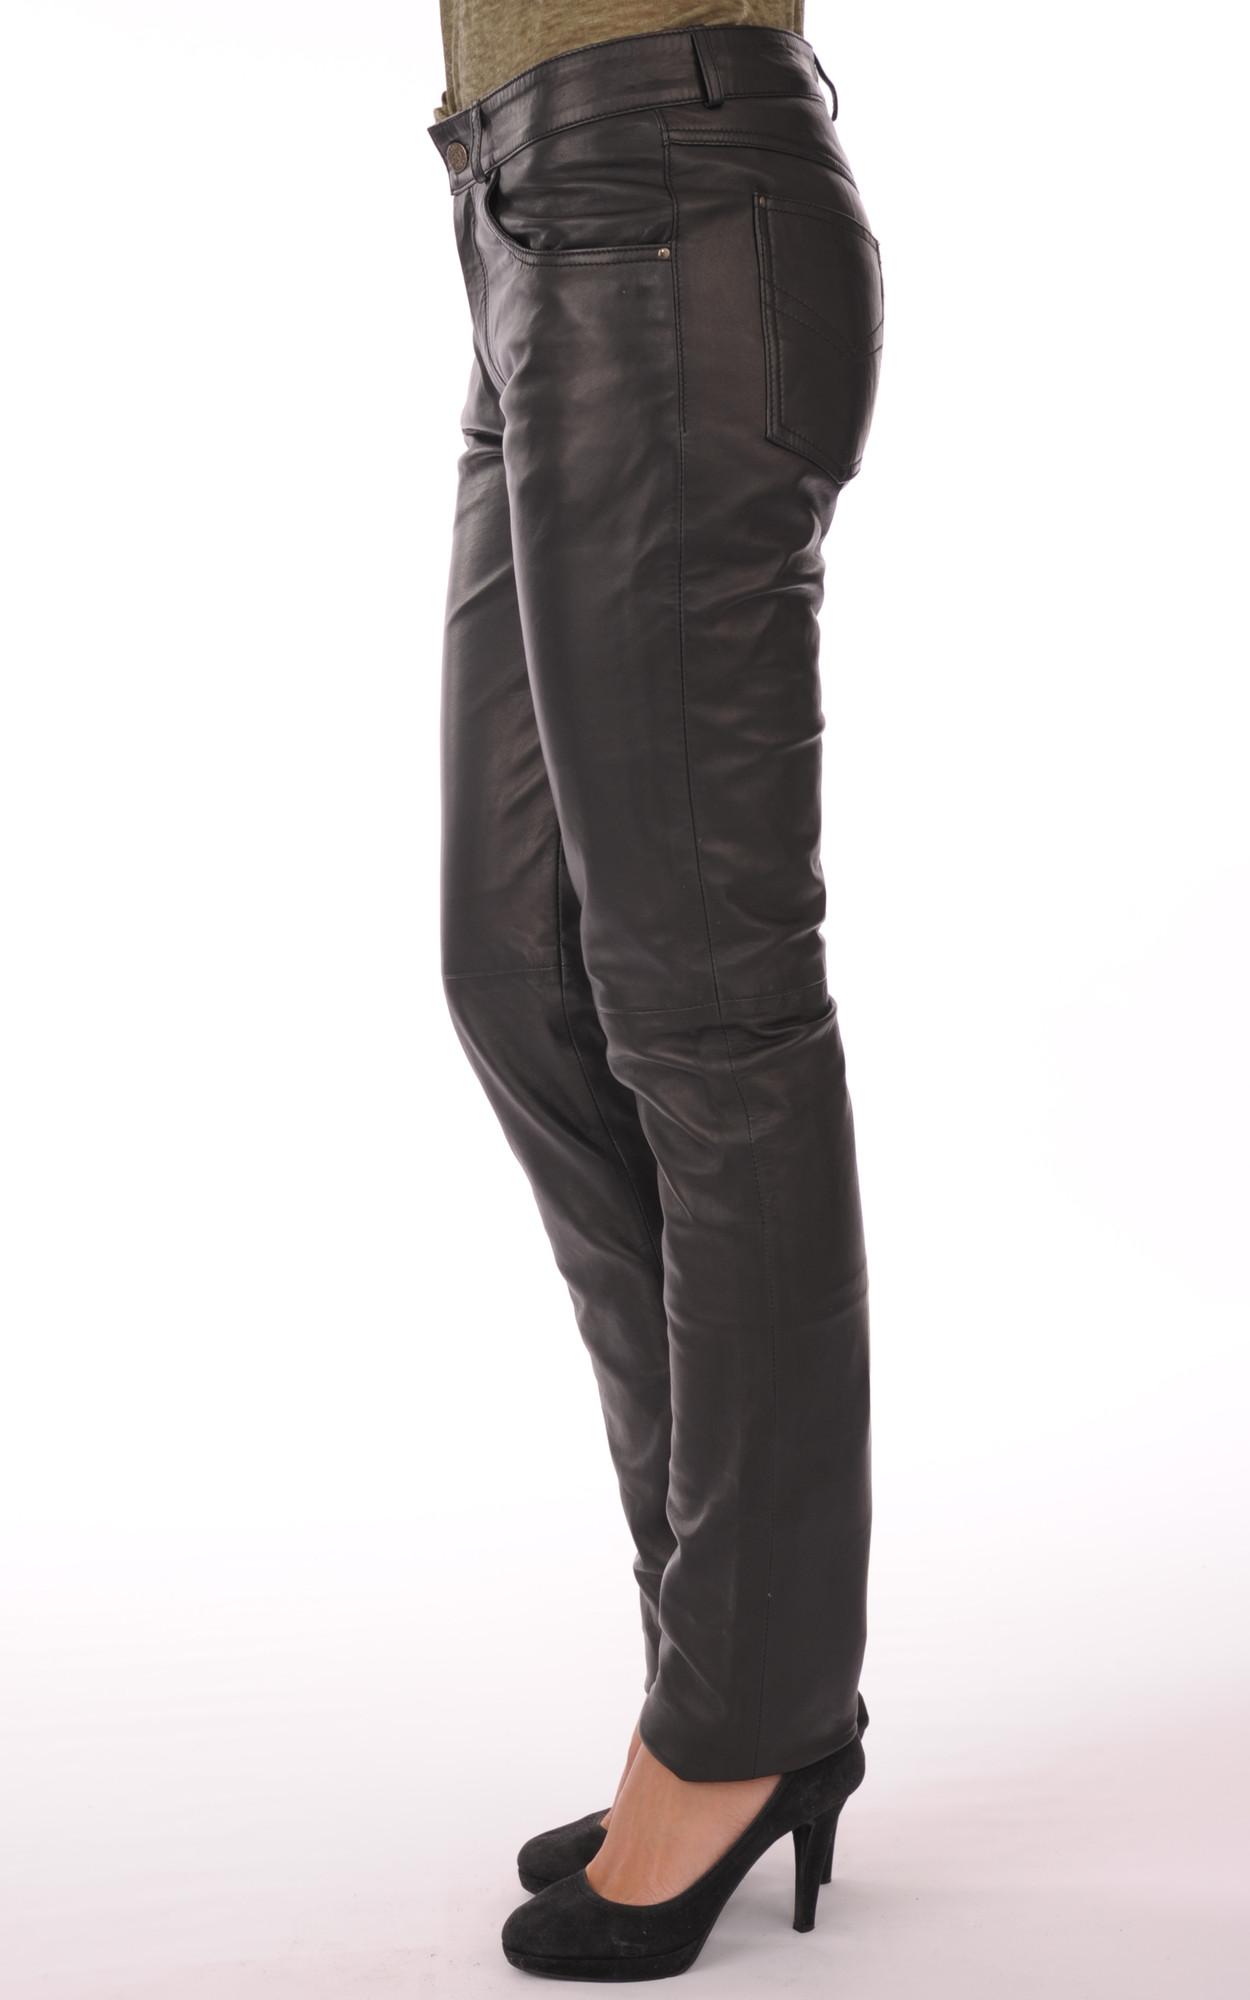 Pantalon En Cuir Noir Femme